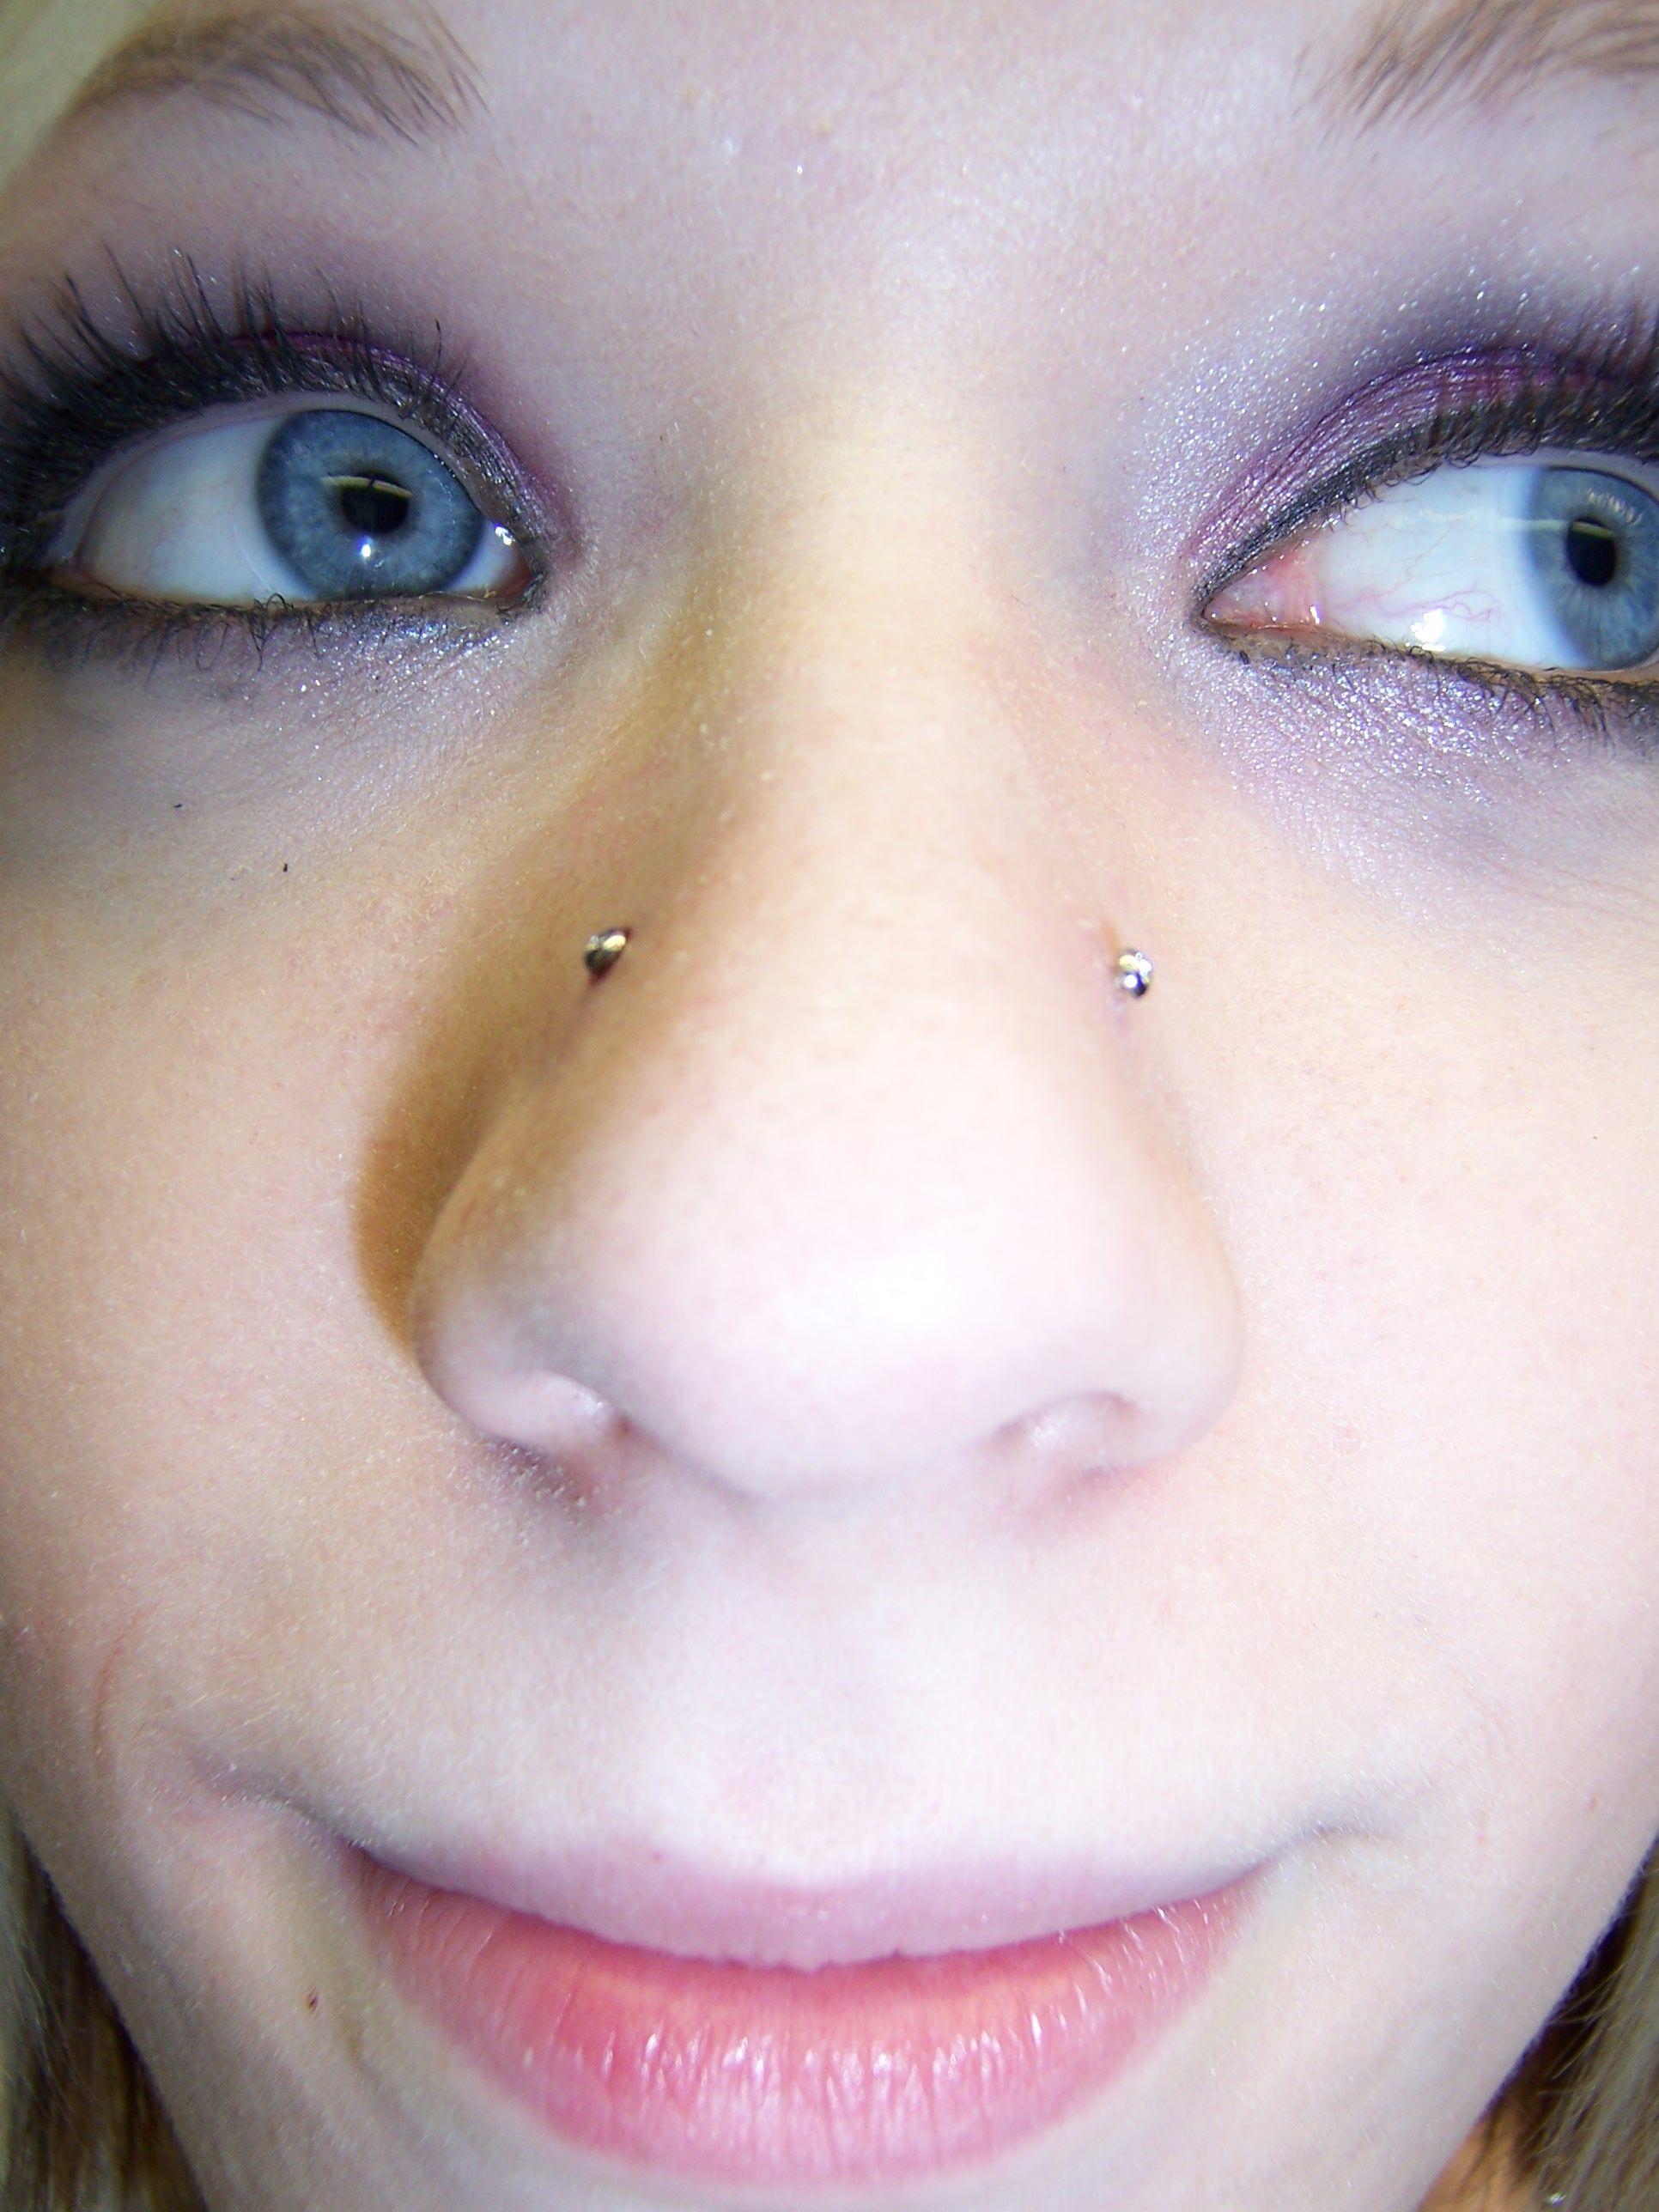 I uc high nostrils  Holes I create  Pinterest  Piercings